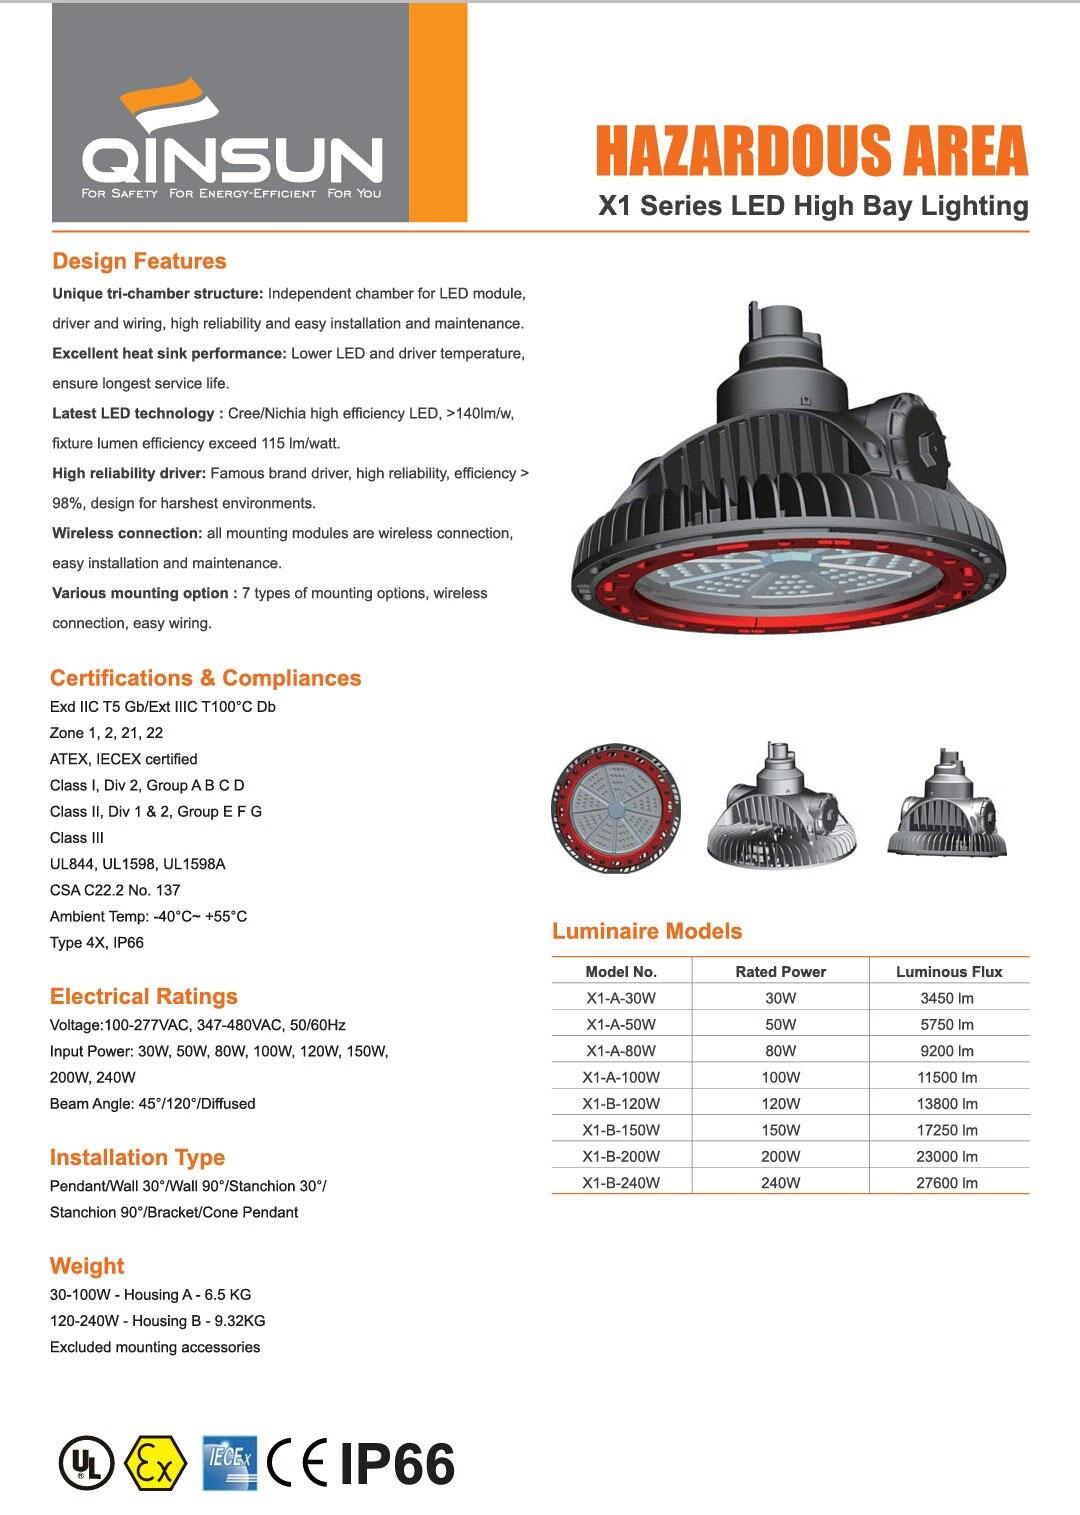 Lampu Led Explosion Proof Qinsun X1 UL Listed - UL844 - UL1589 High Bay Flo